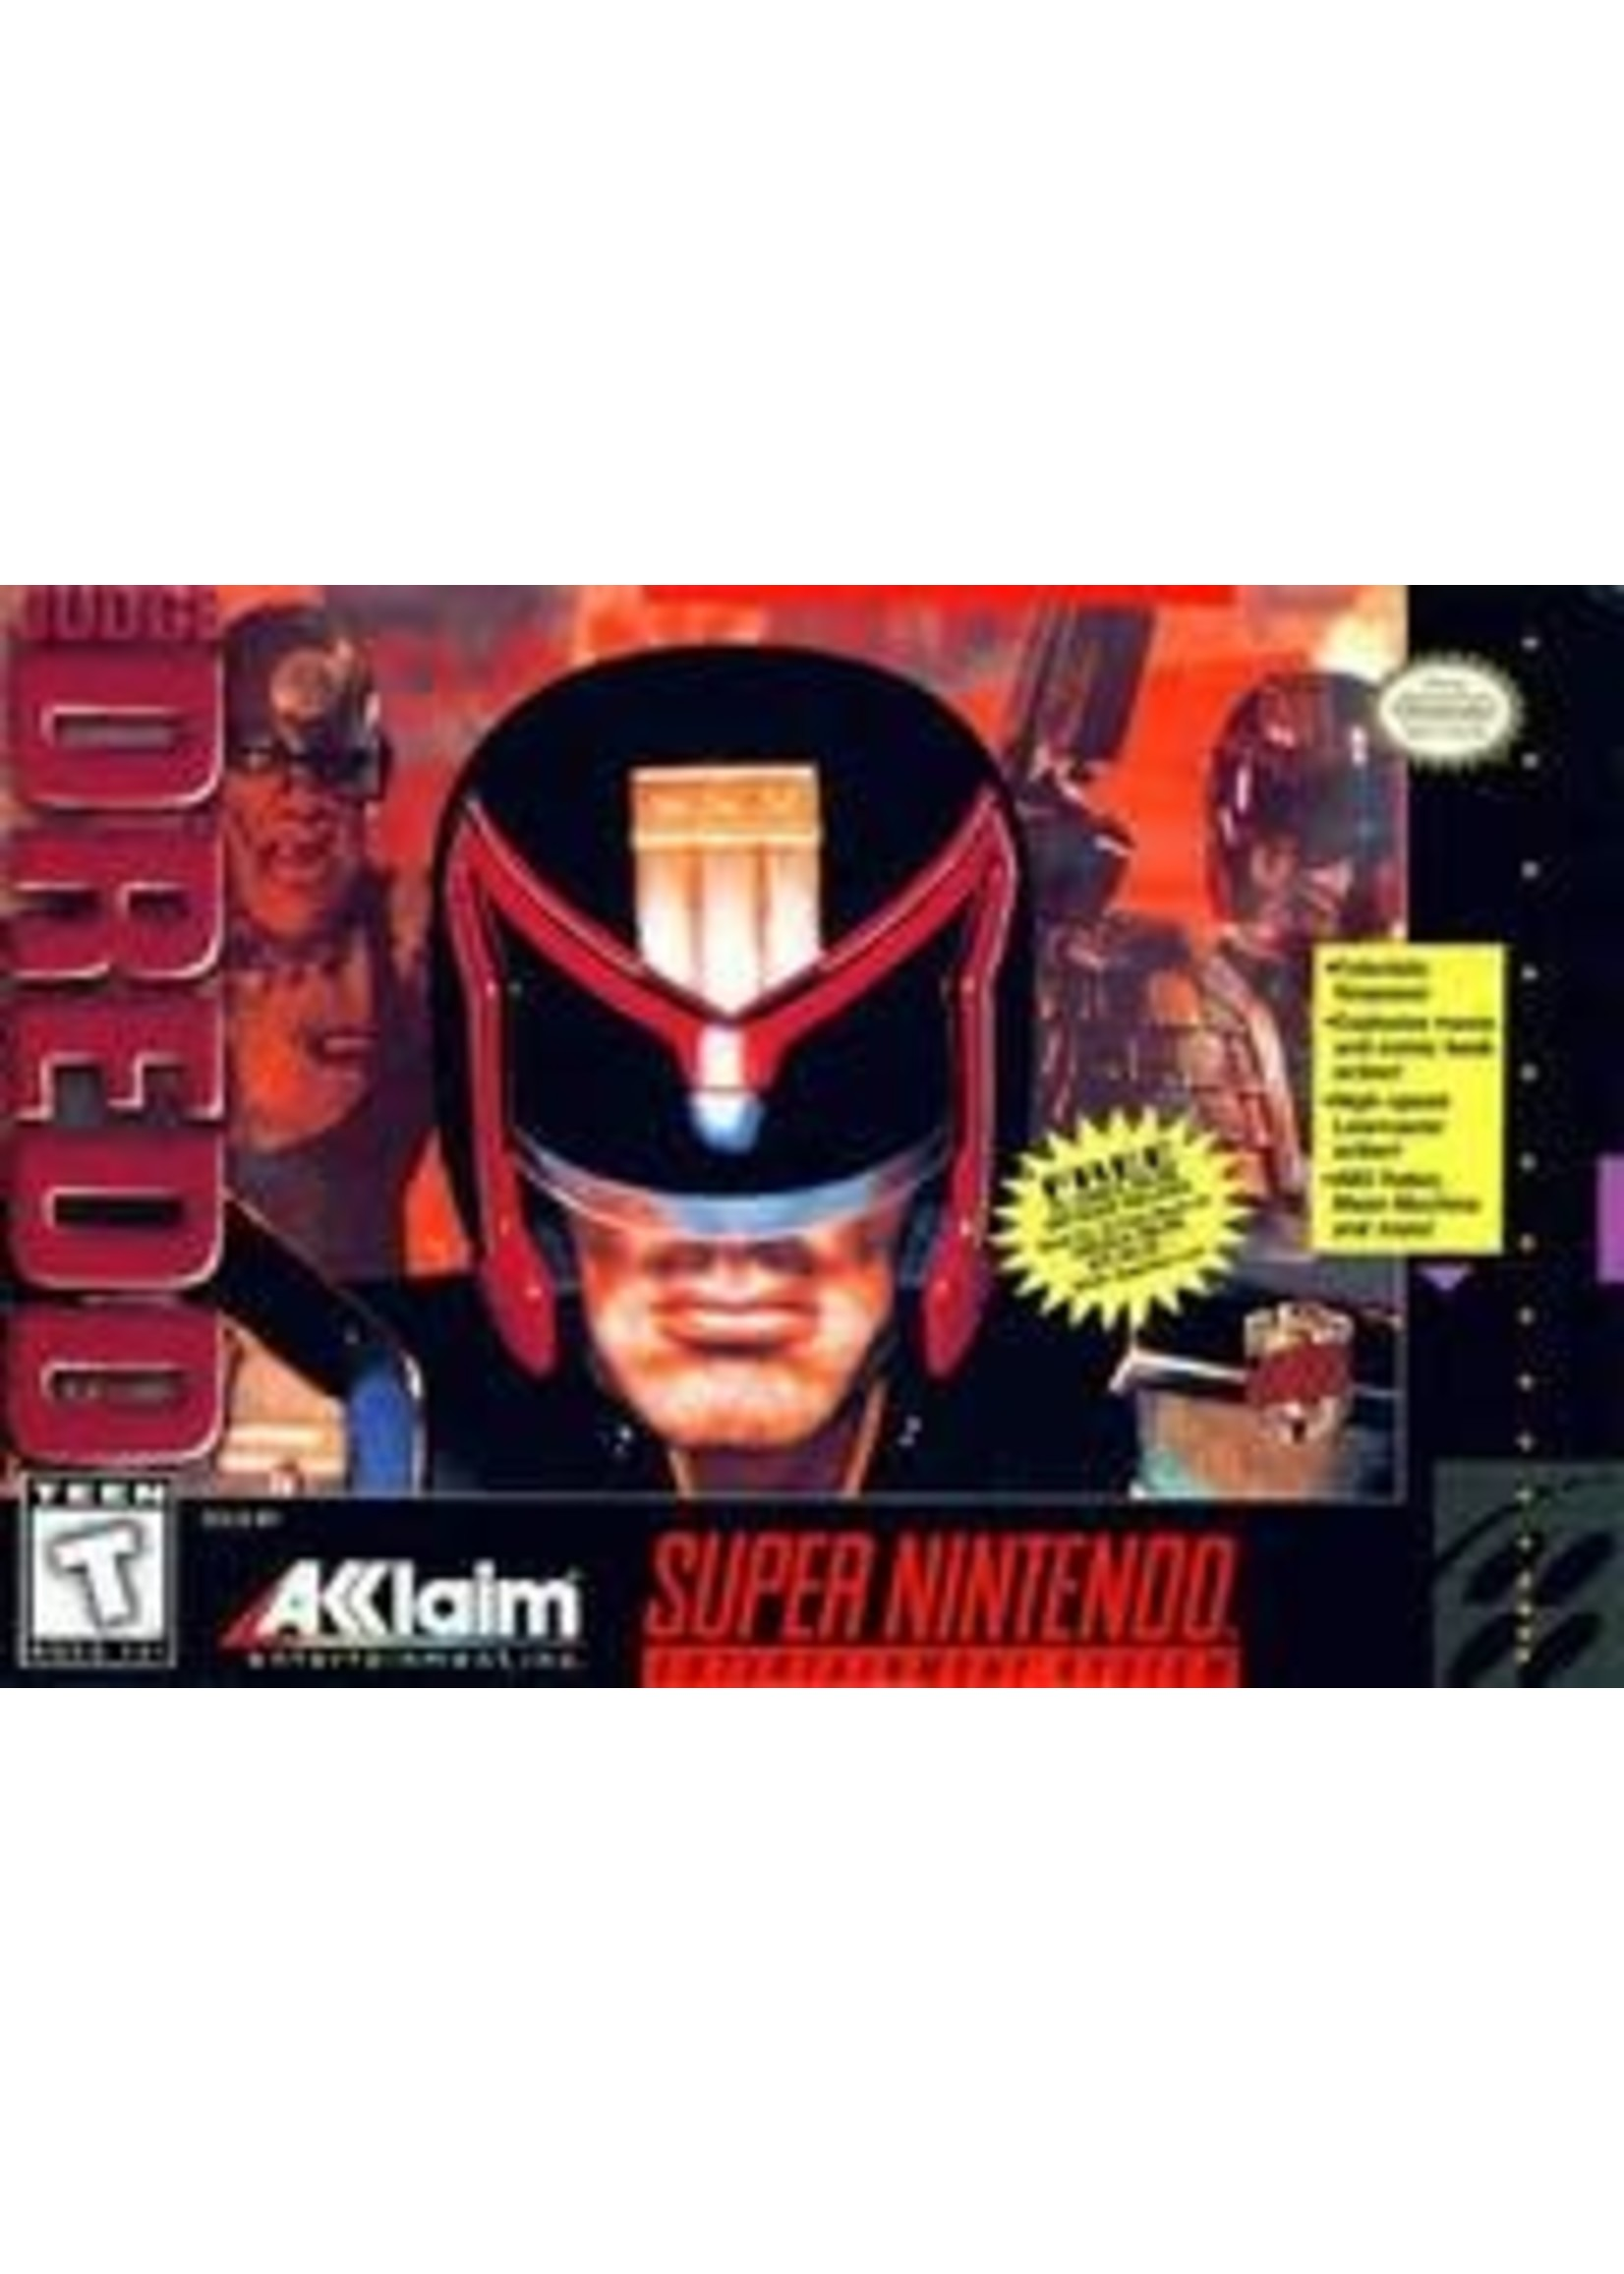 Judge Dredd Super Nintendo